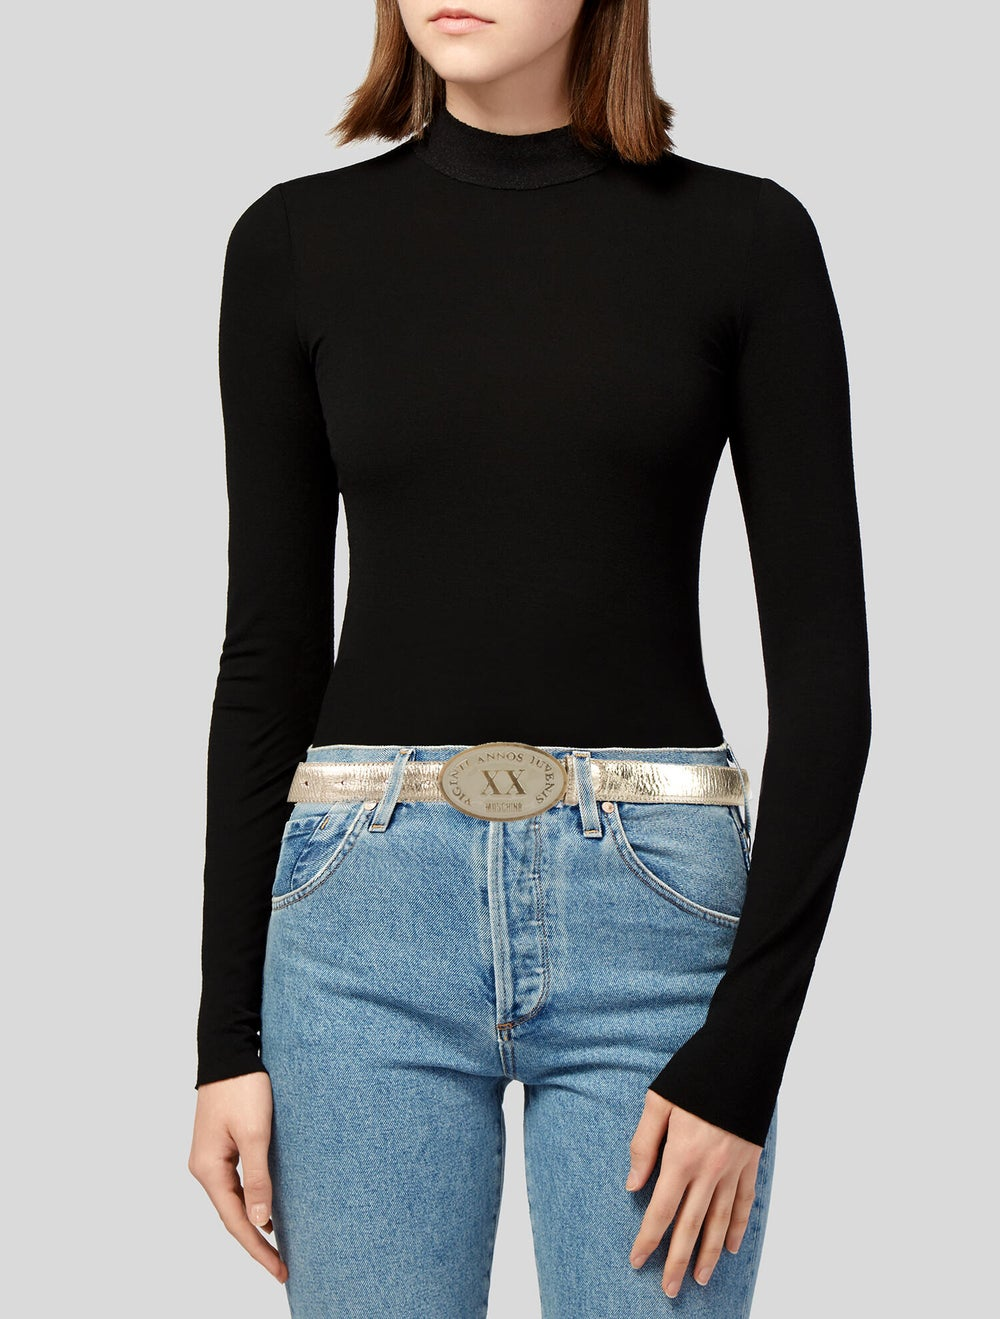 Moschino Leather Belt Gold - image 2